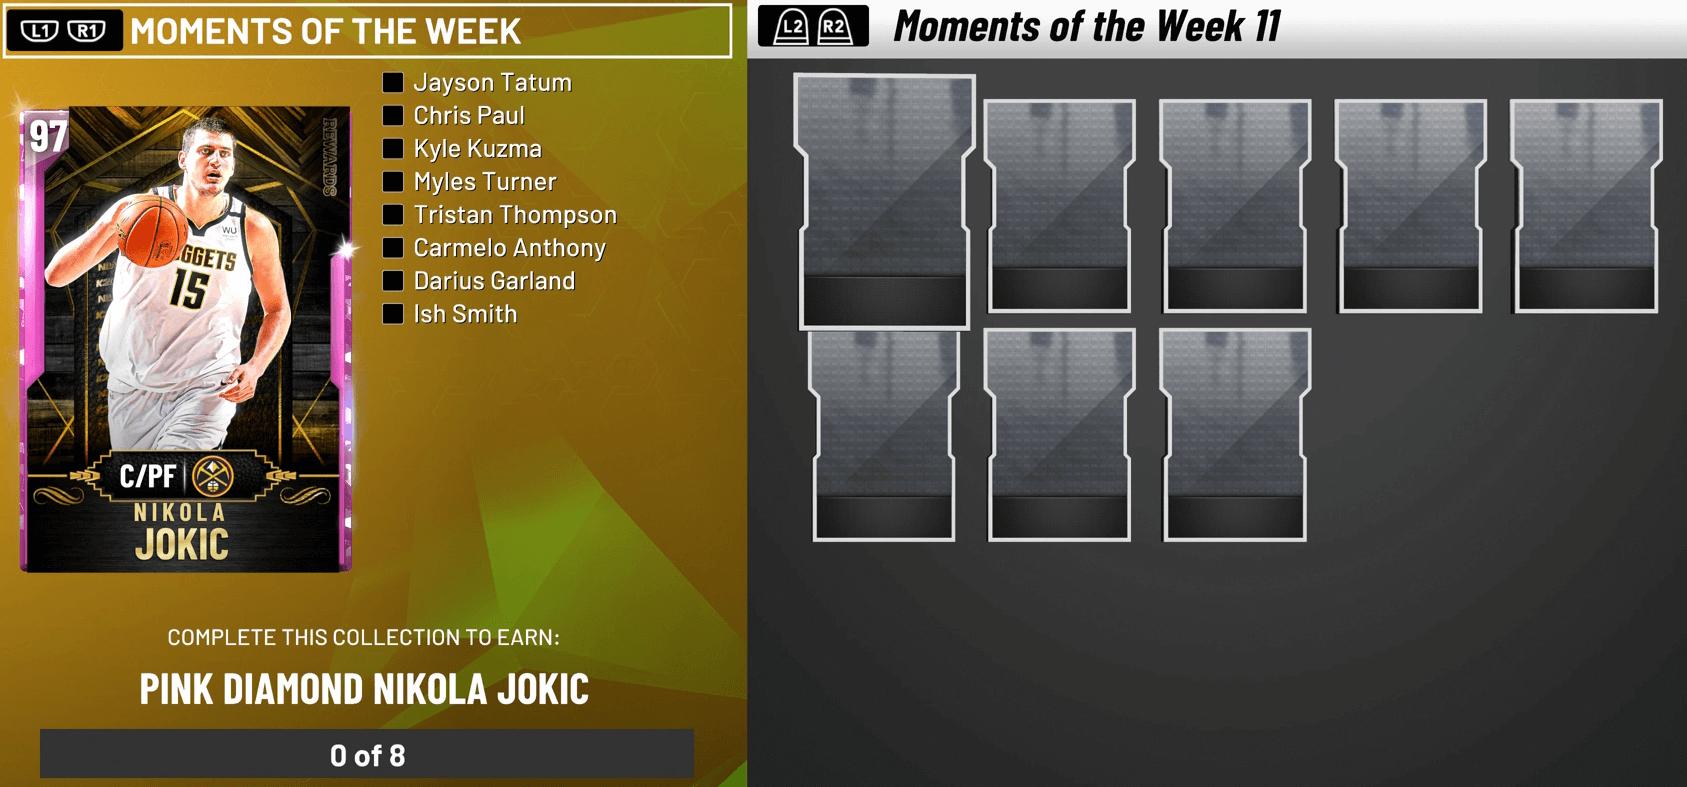 nba-2k20-my-team-moments-of-week-11-jokic-reward